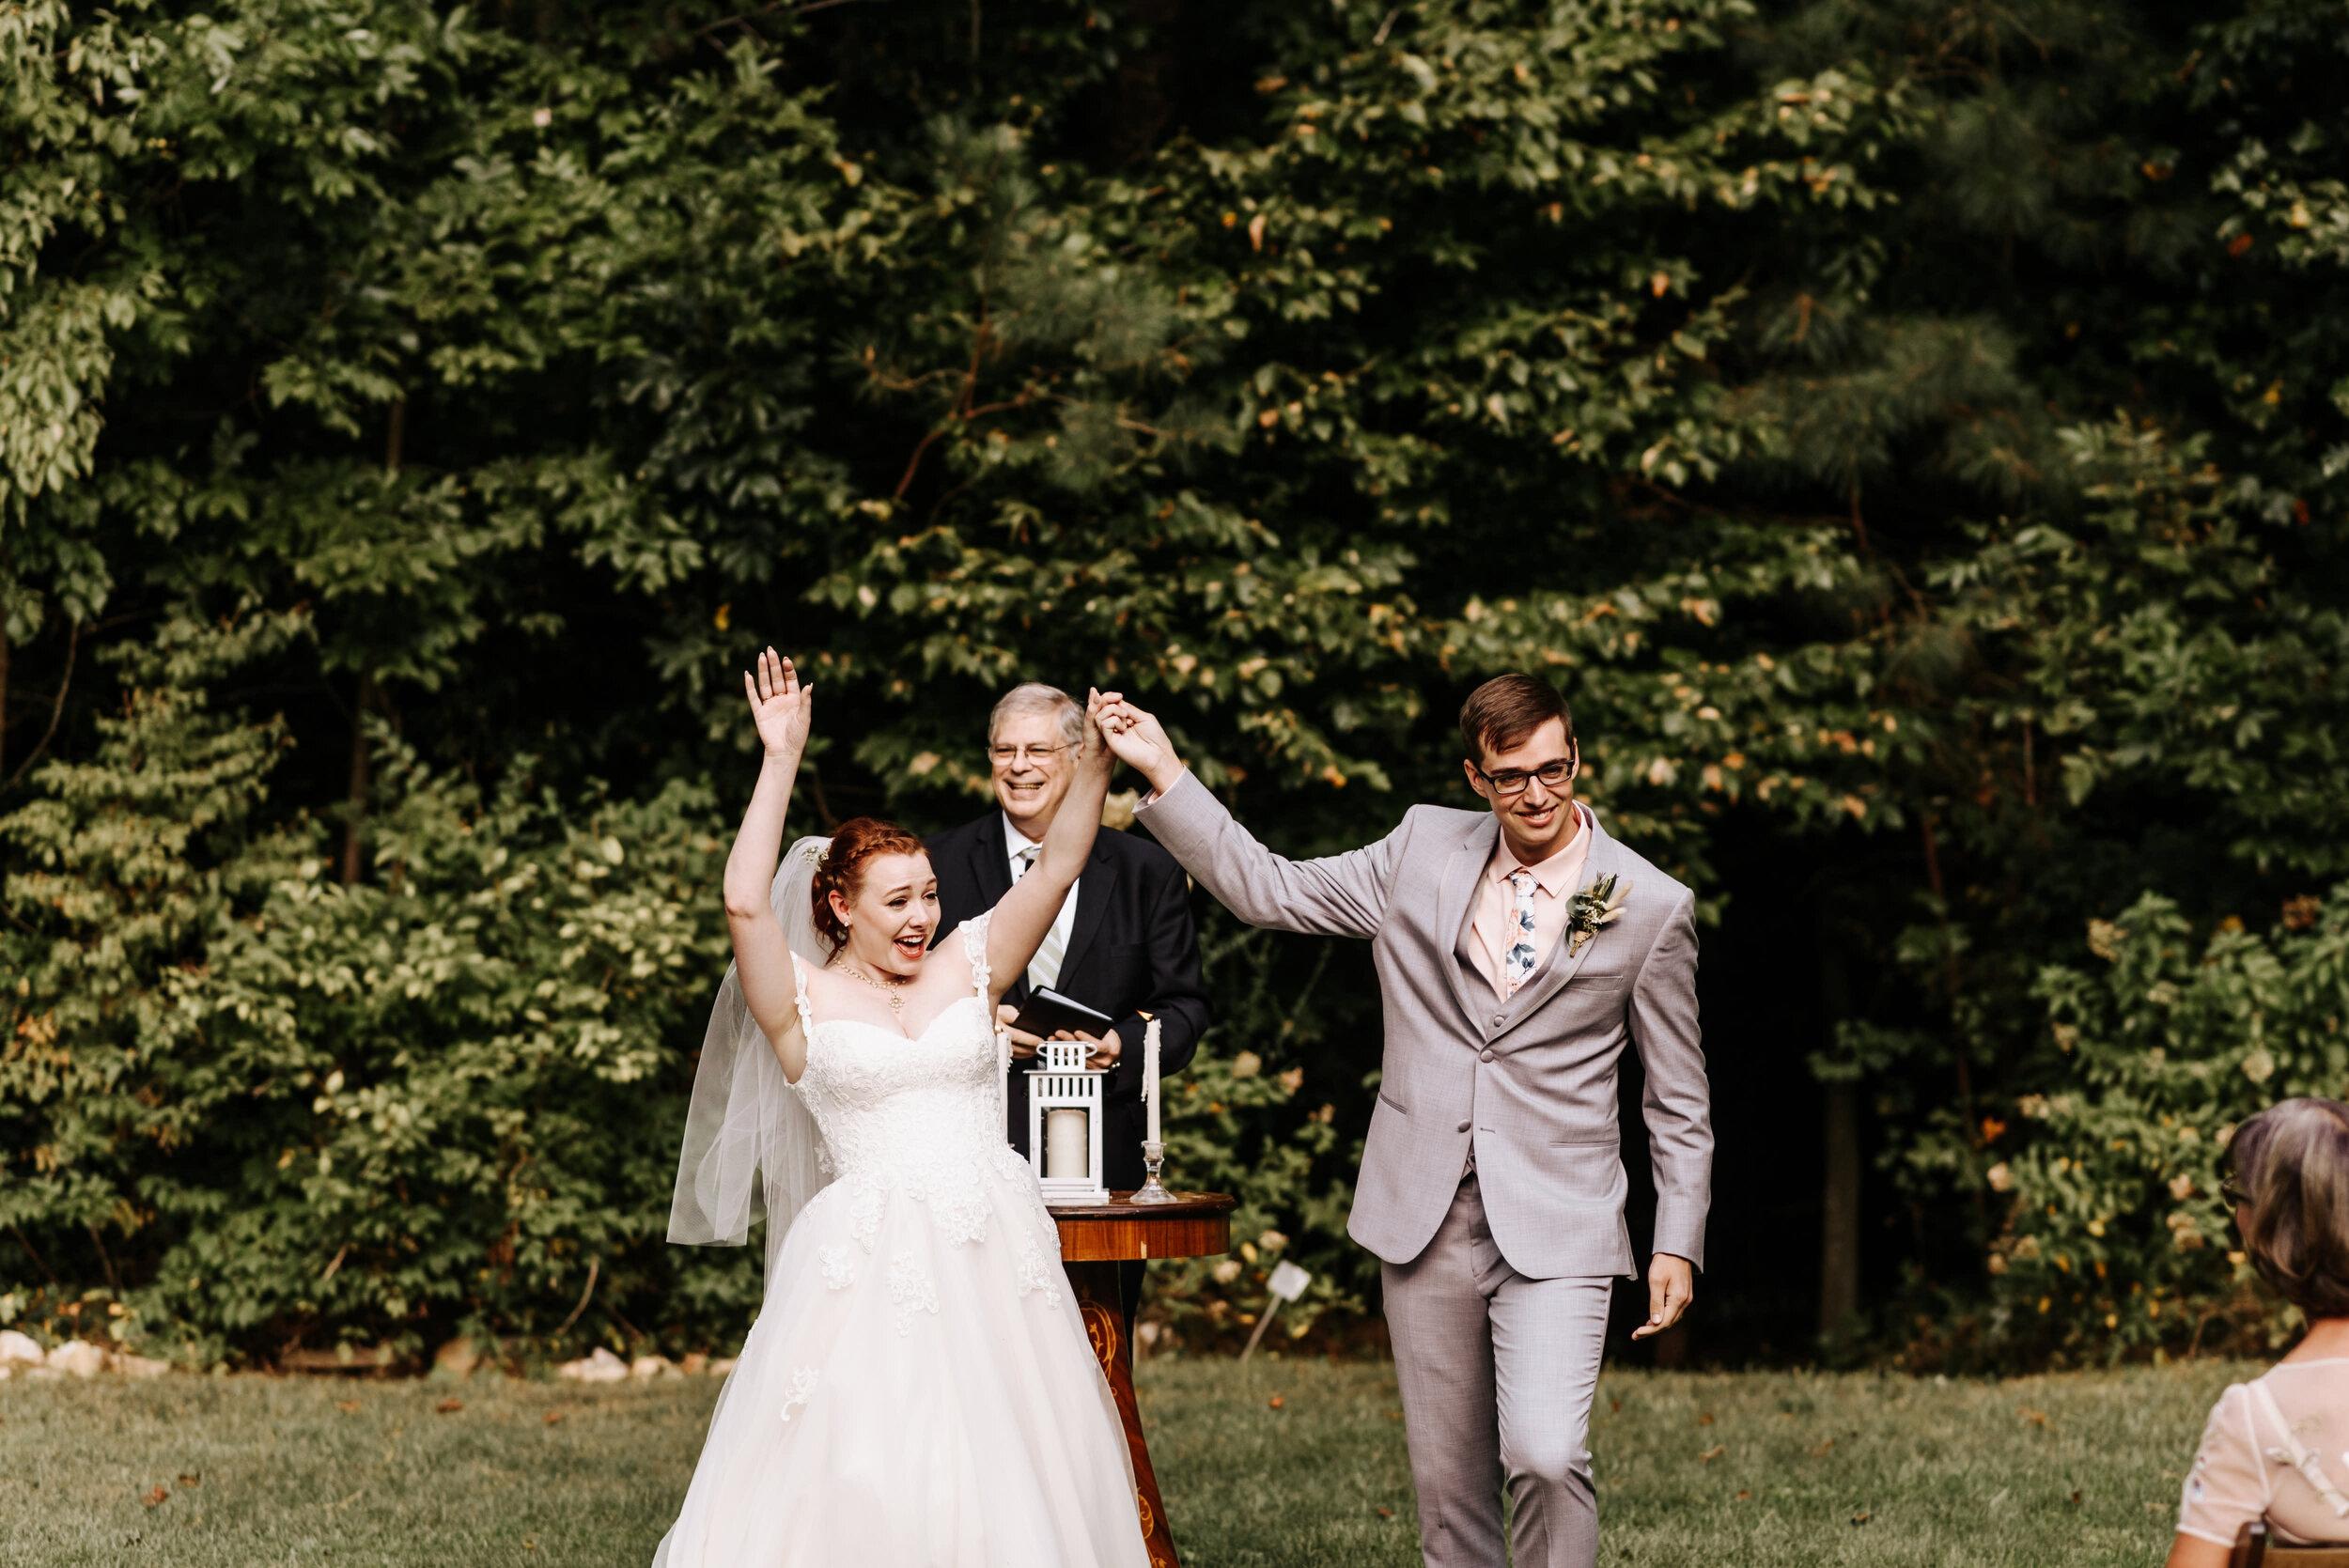 Rachel_David_Wedding_Richmond_Virginia_Photography_by_V_27.jpg